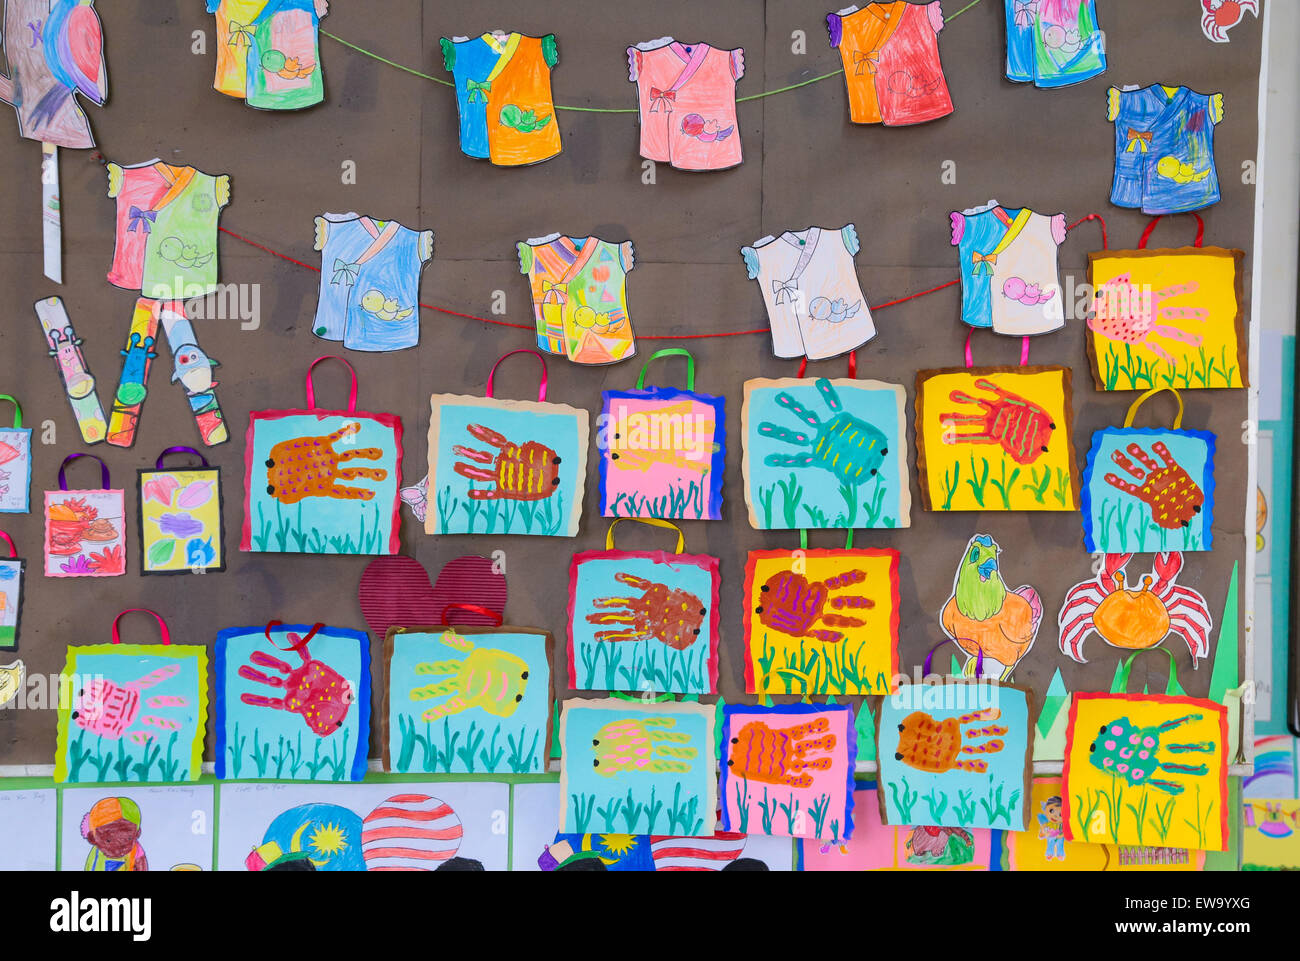 Children Handicrafts Displayed At Kindergarten Art And Handiwork Corner